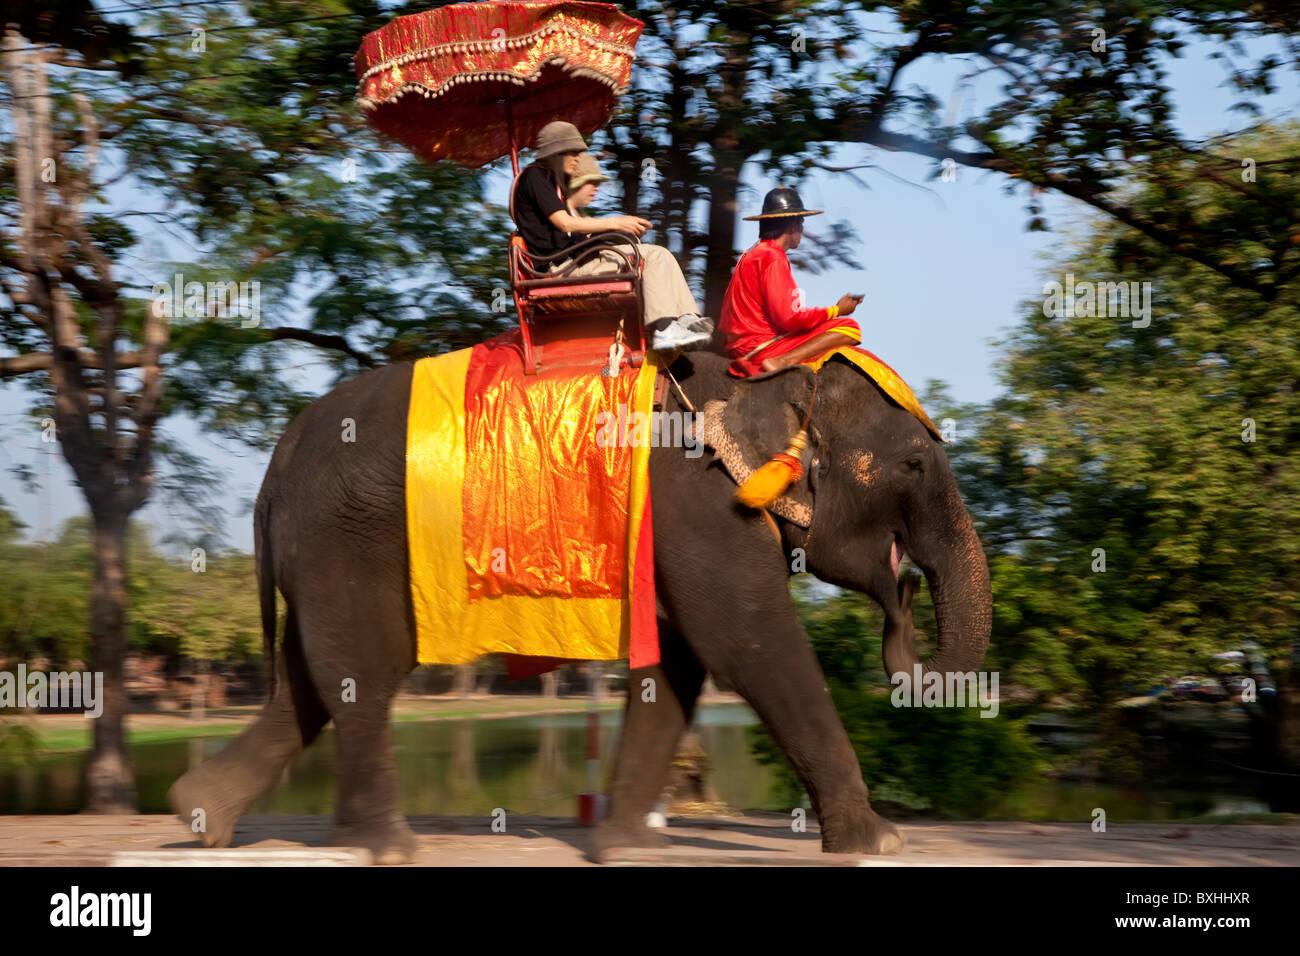 Elefant Touristenfahrten, Ayutthaya, Thailand Stockbild